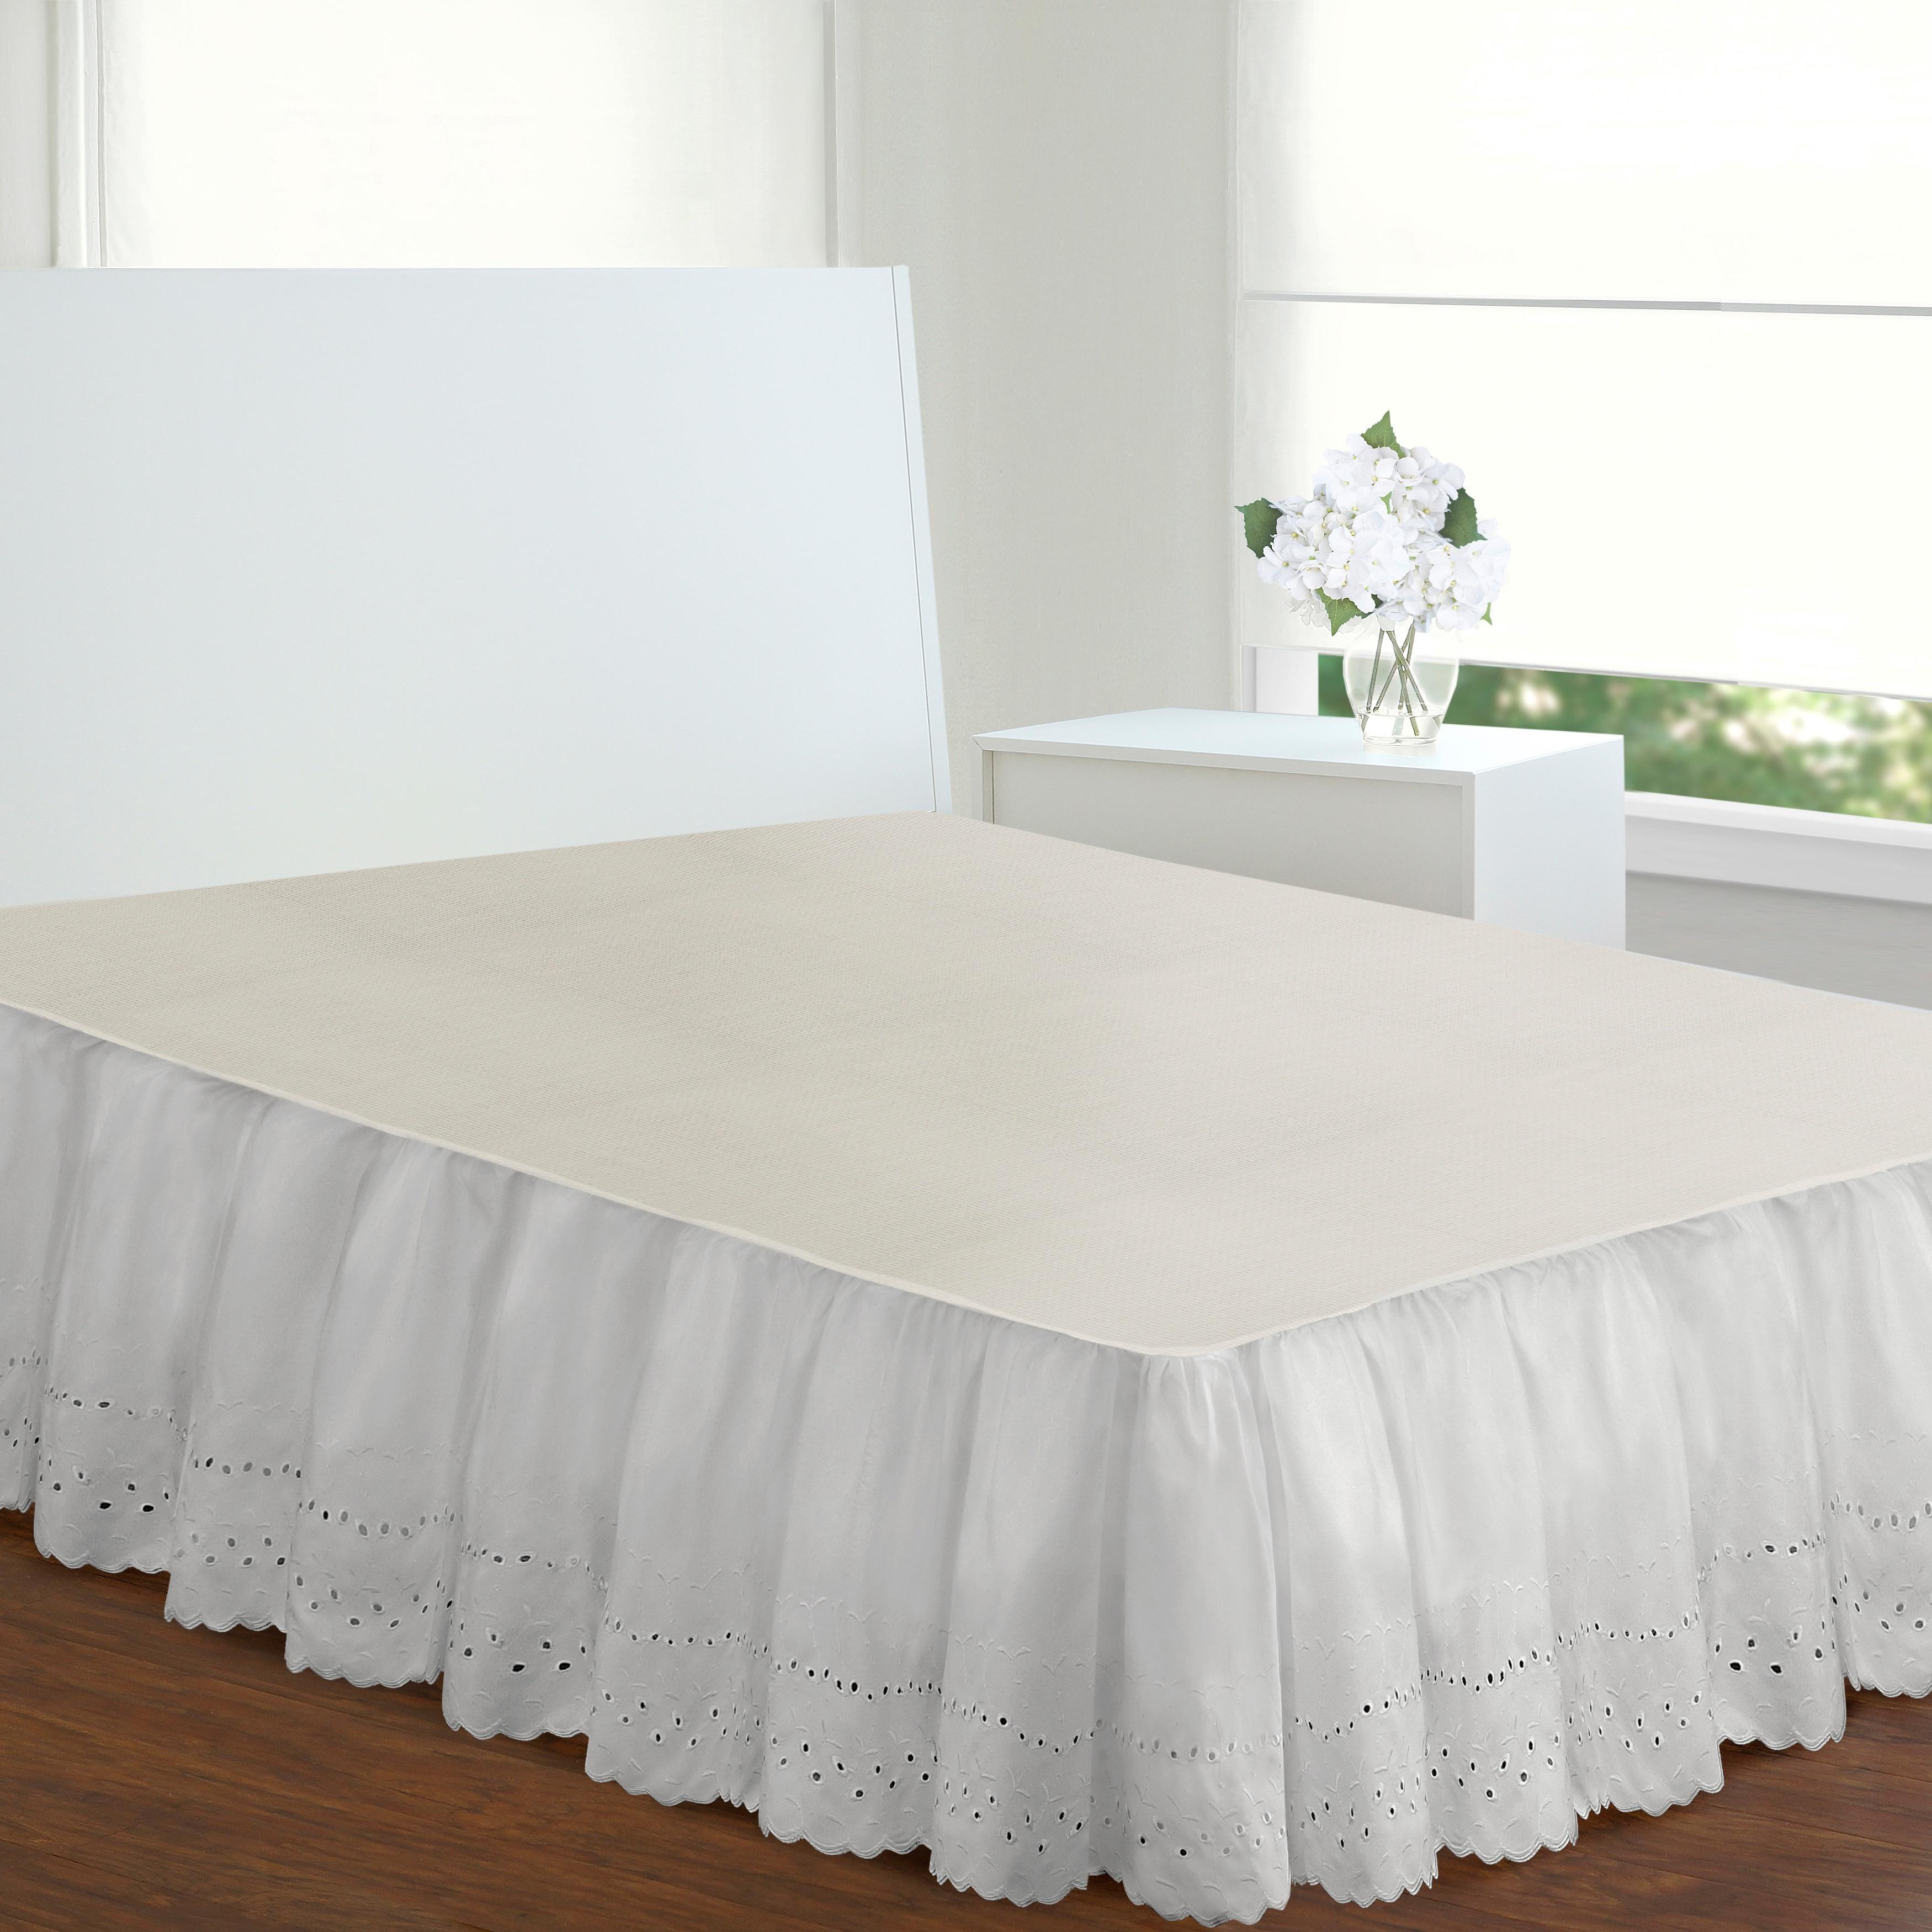 Ivory Cream Bedskirt Linen Bed Skirt Natural Ruffles Dust Ruffle Shabby Chic